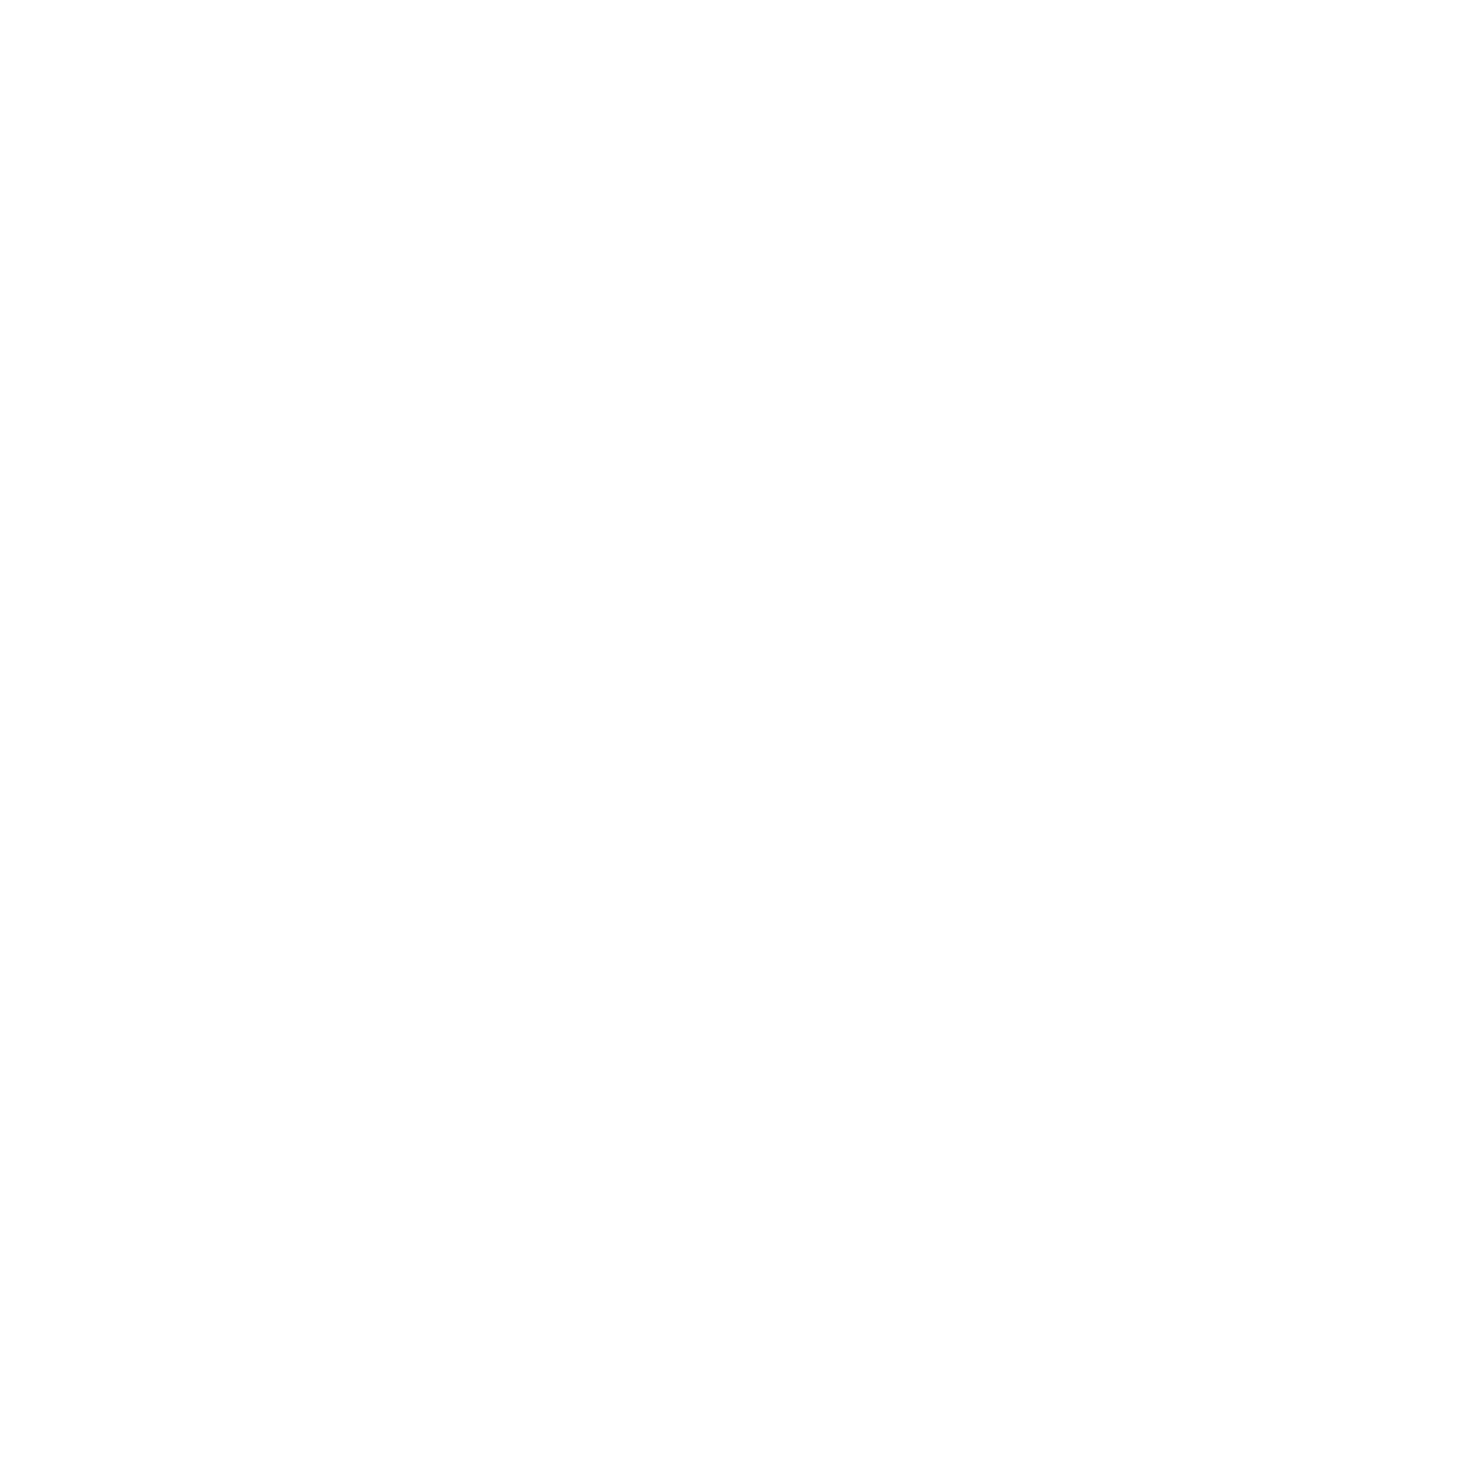 icon-demo-white